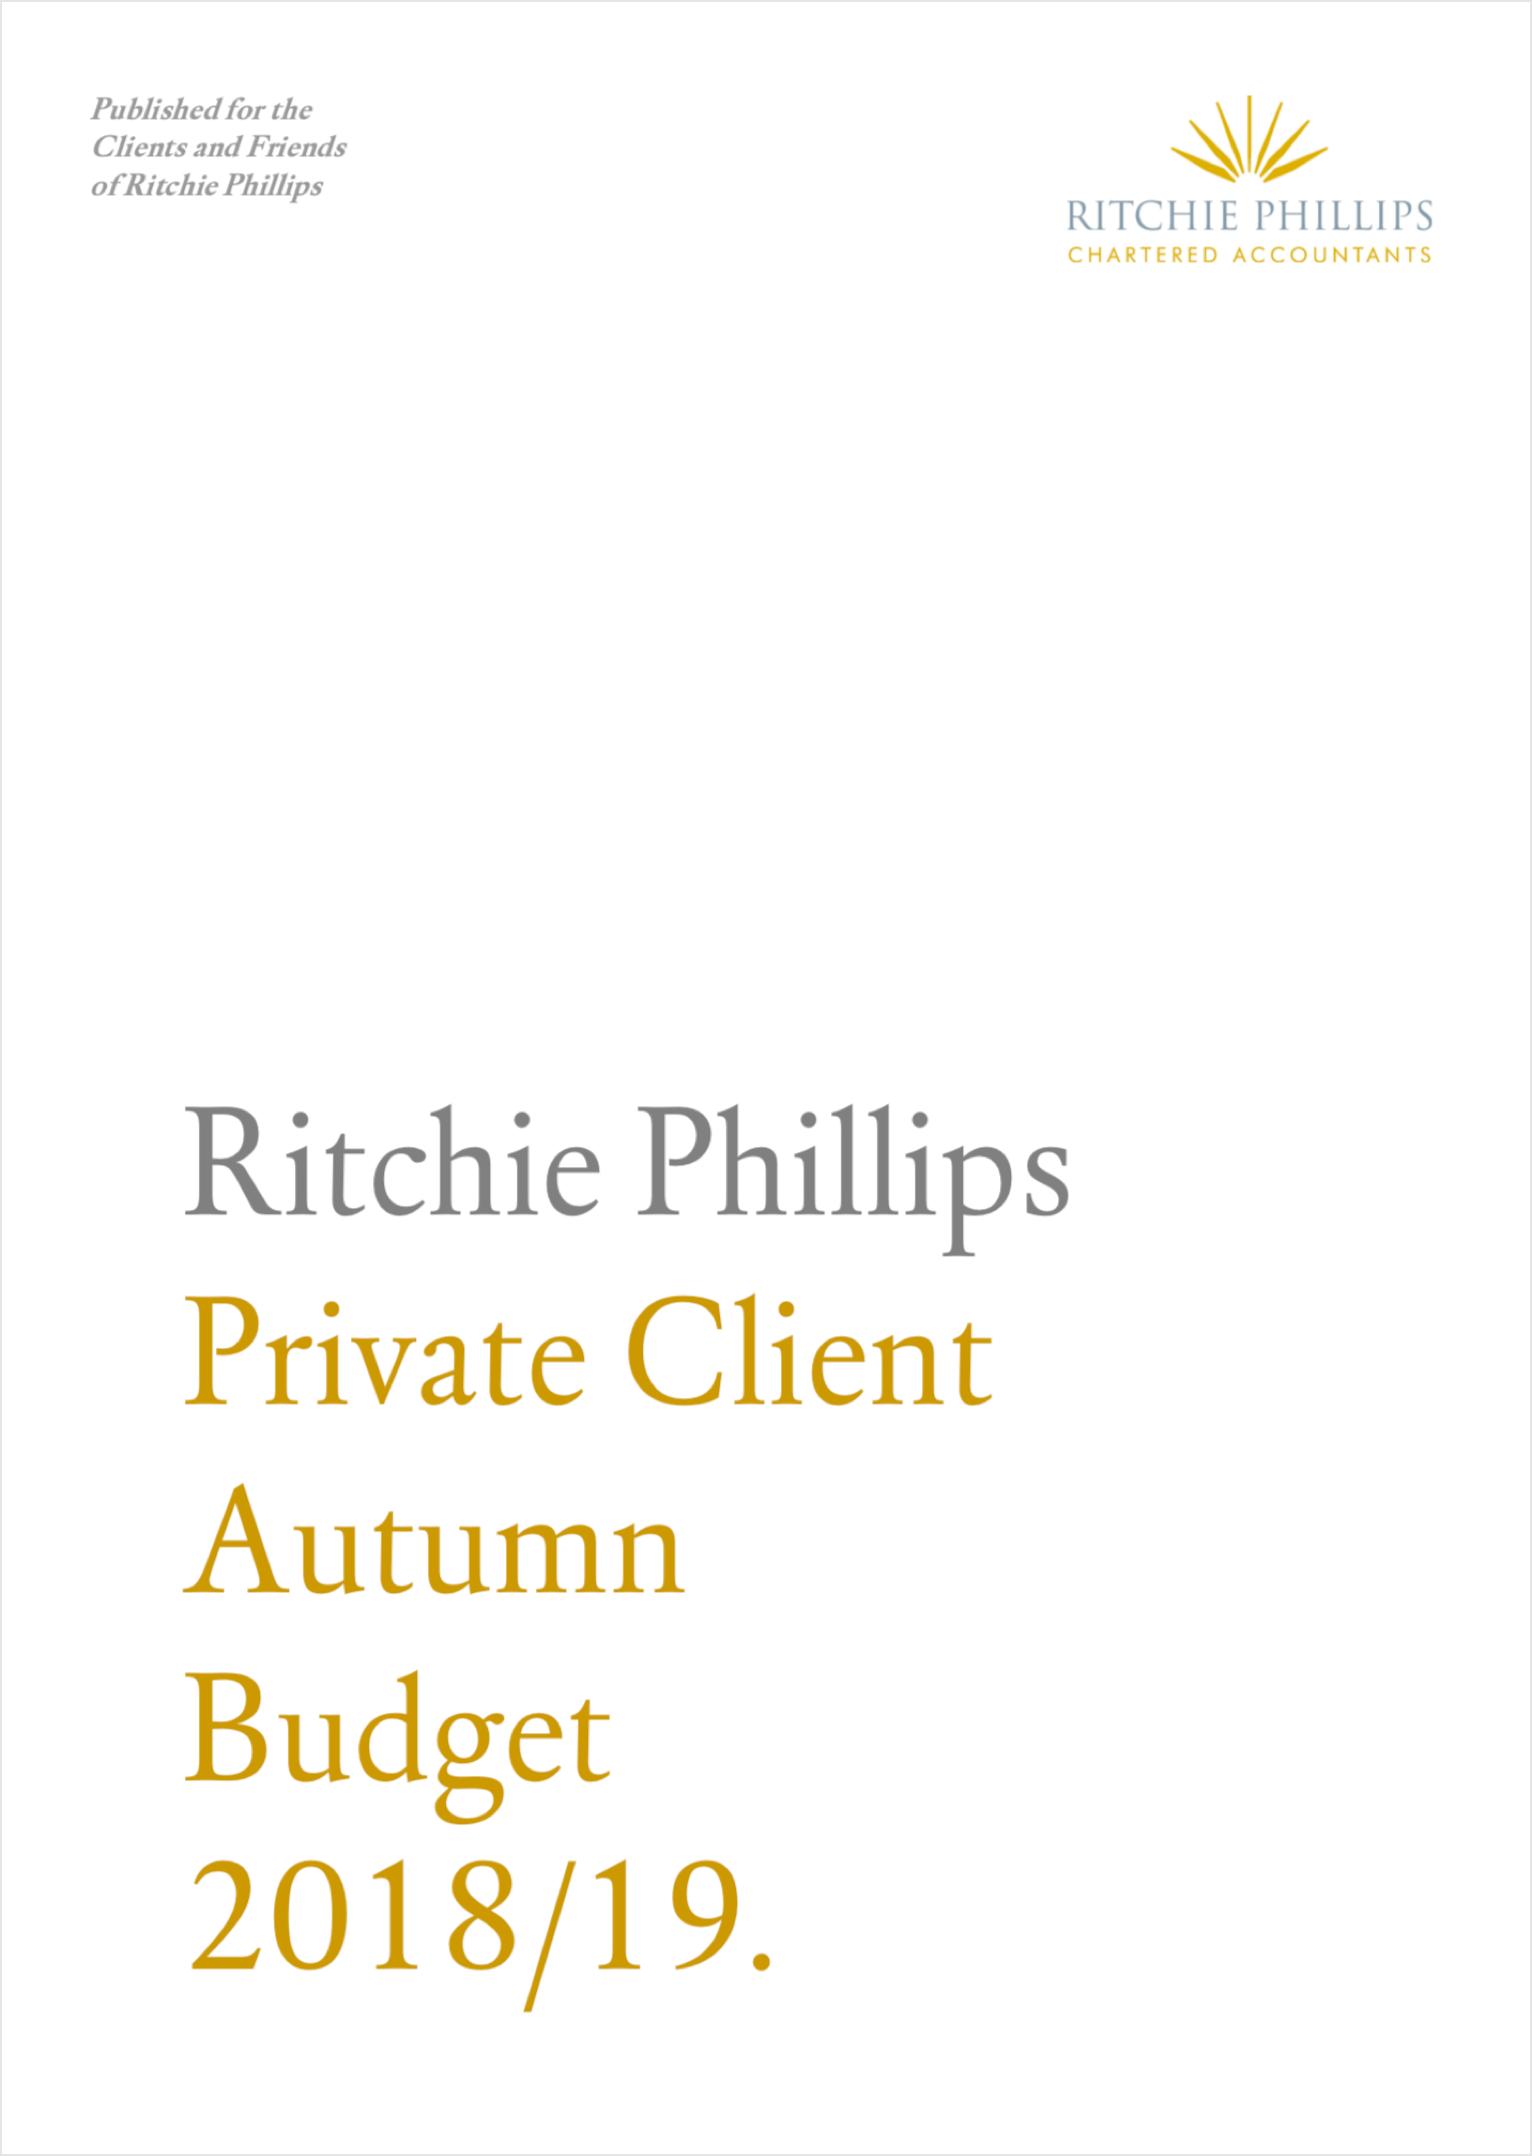 img-pdf-cover-autumn-budget-2018-19